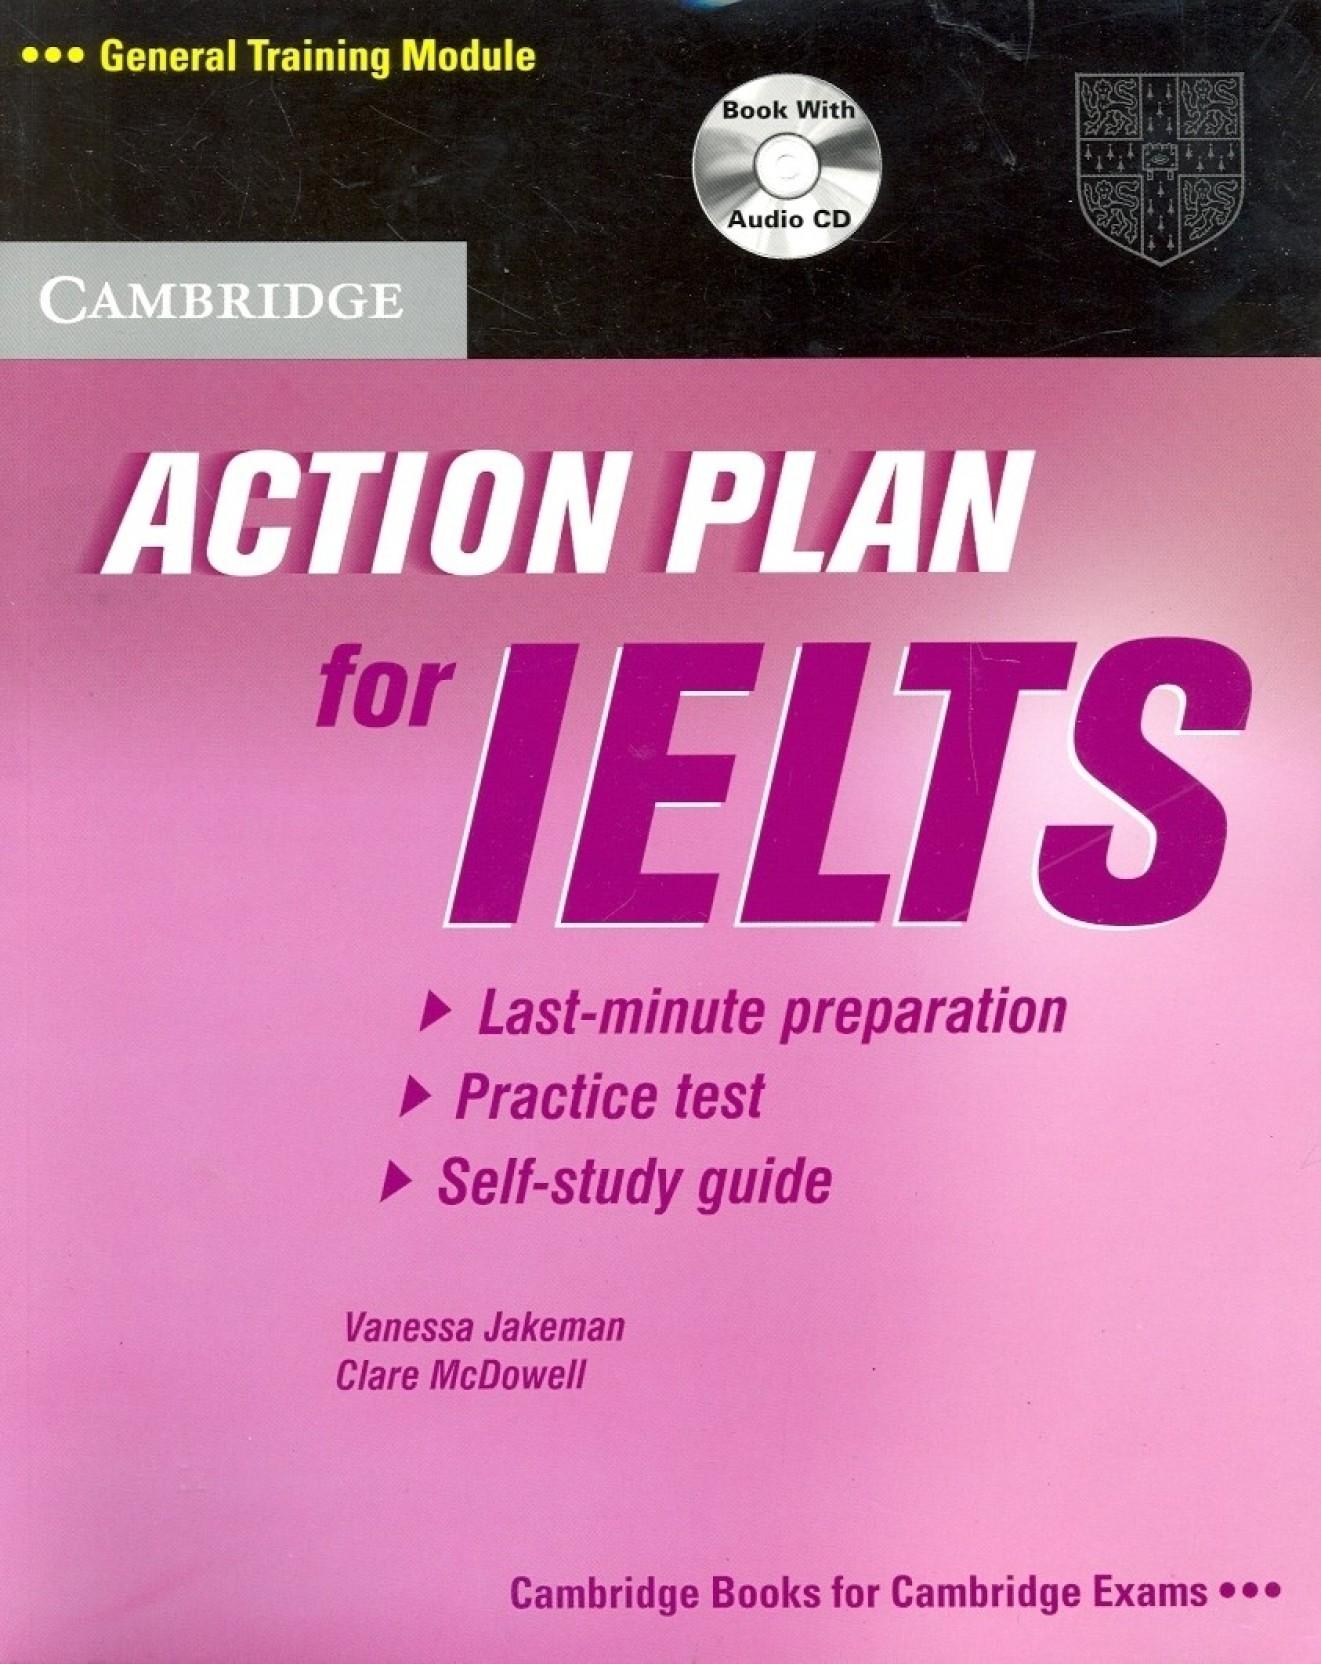 IELTS for study